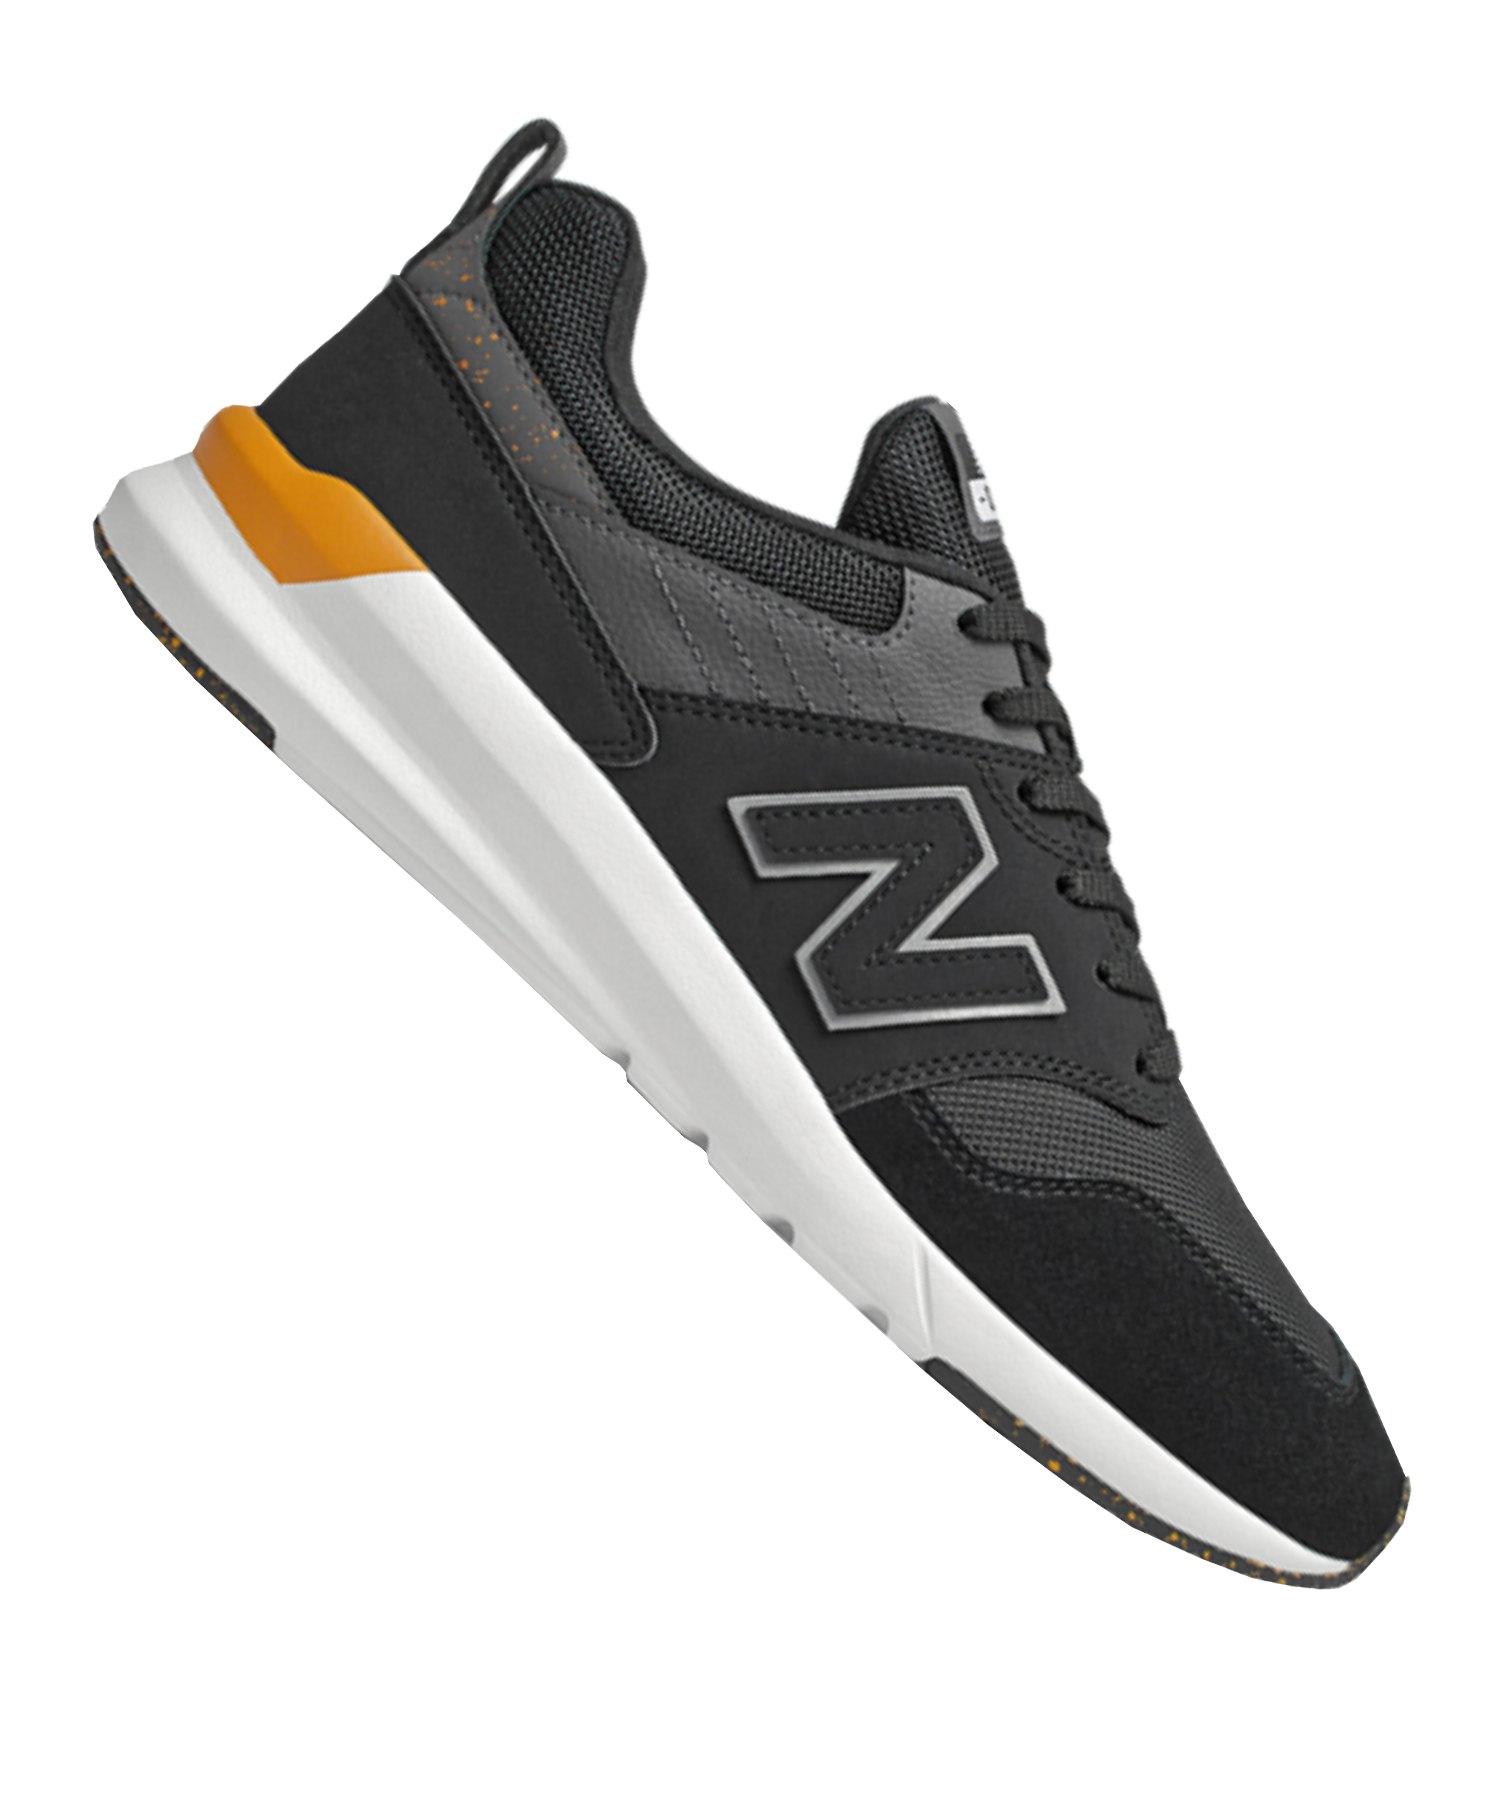 New Balance MLS009 D Sneaker Schwarz F8 - schwarz